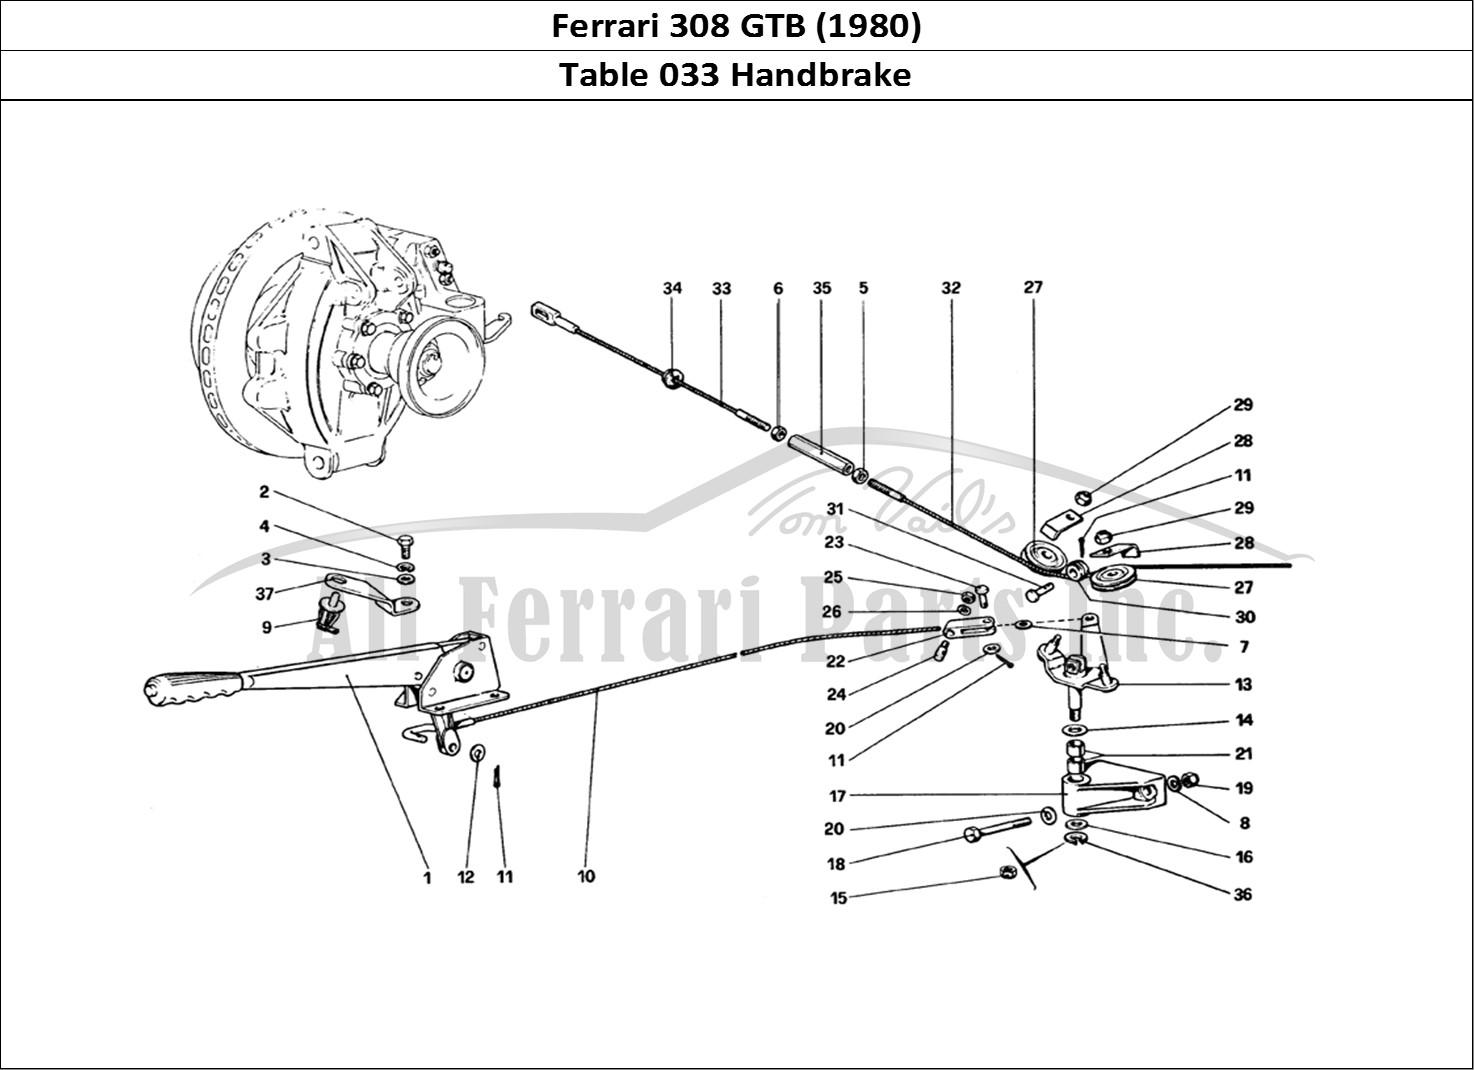 Buy original Ferrari 308 GTB (1980) 033 Handbrake Ferrari